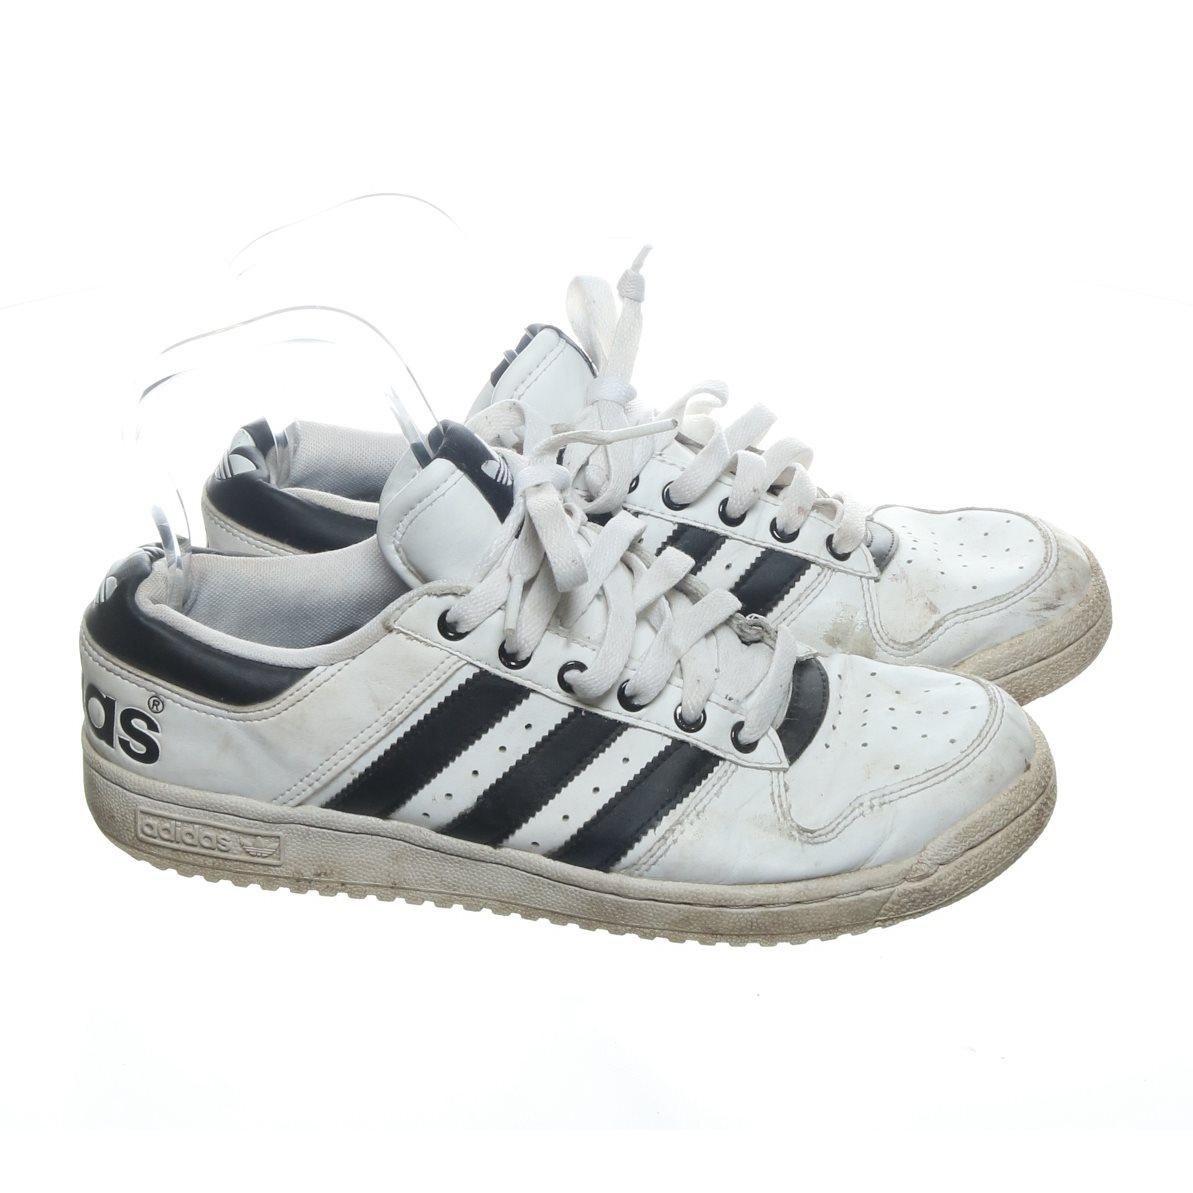 best service 00c2c e0f1c Adidas, Sneakers, Strl 41, VitSvart